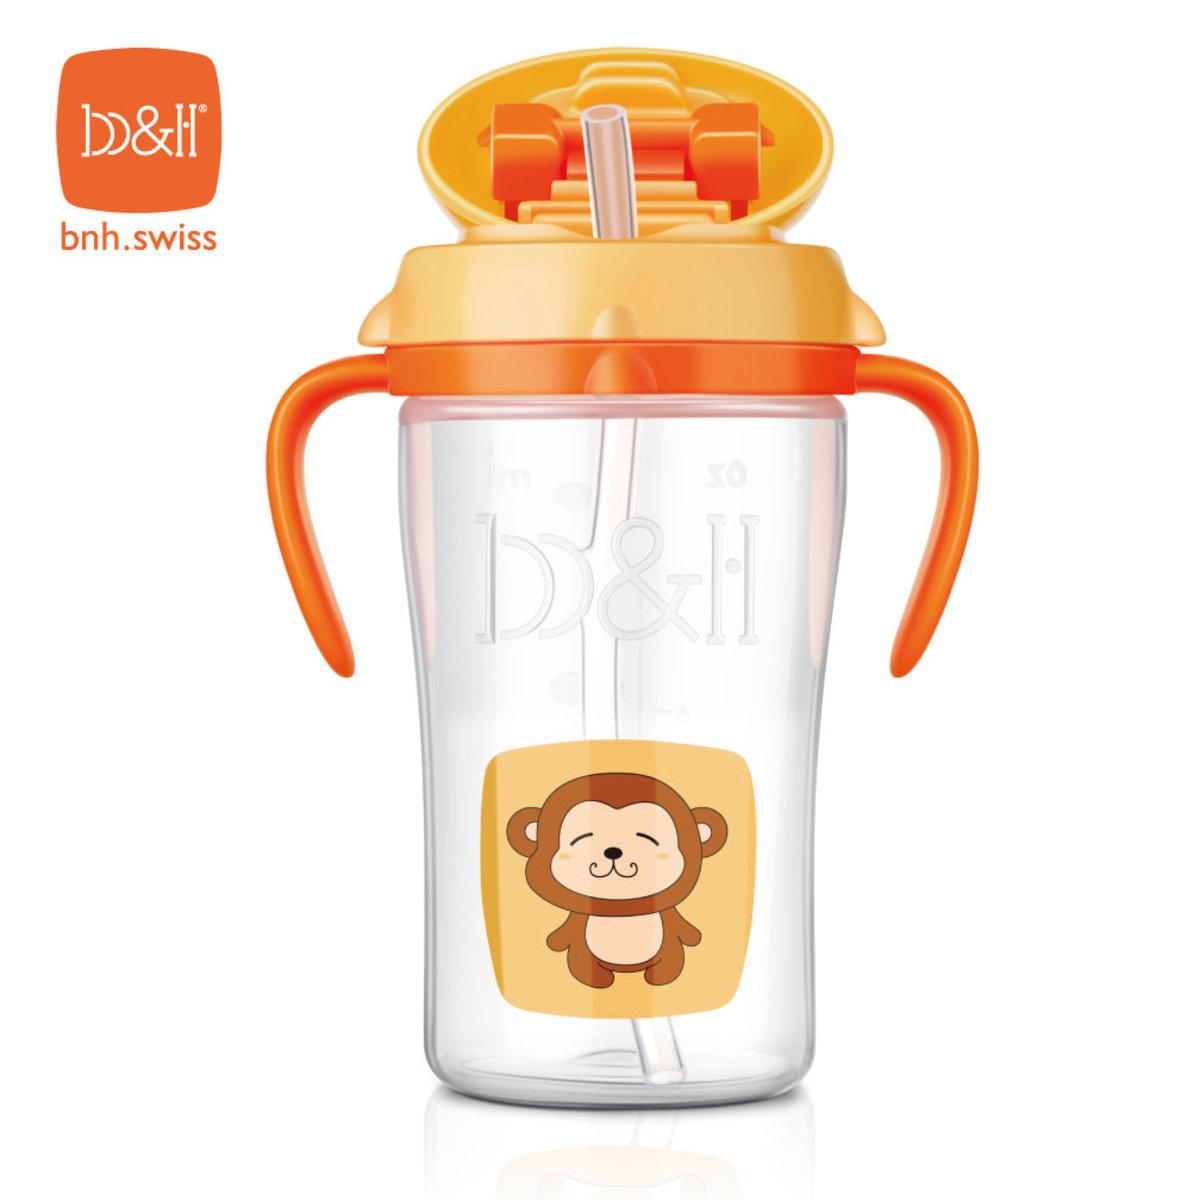 b&h (Swiss) Training Cup 300ml (Monkey)